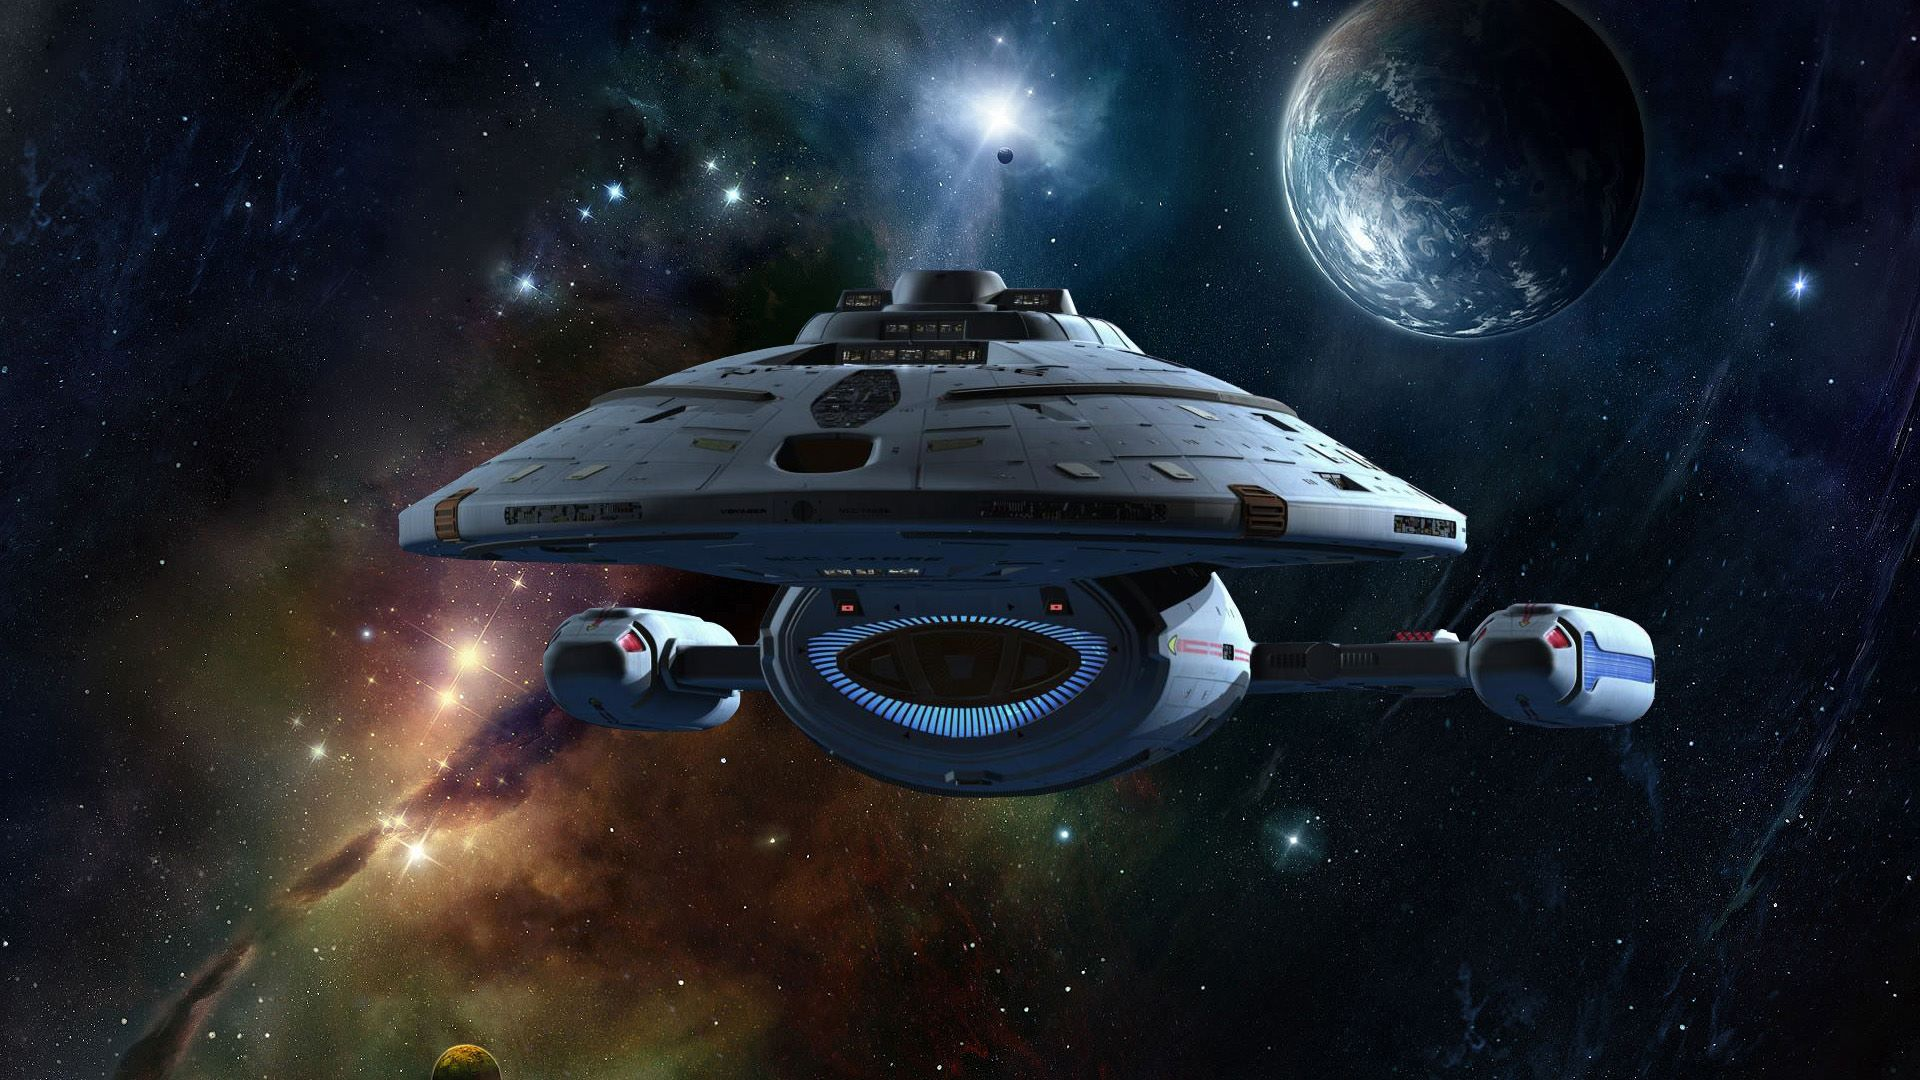 Star Trek Voyager Fondo De Pantalla Hd Fondo De